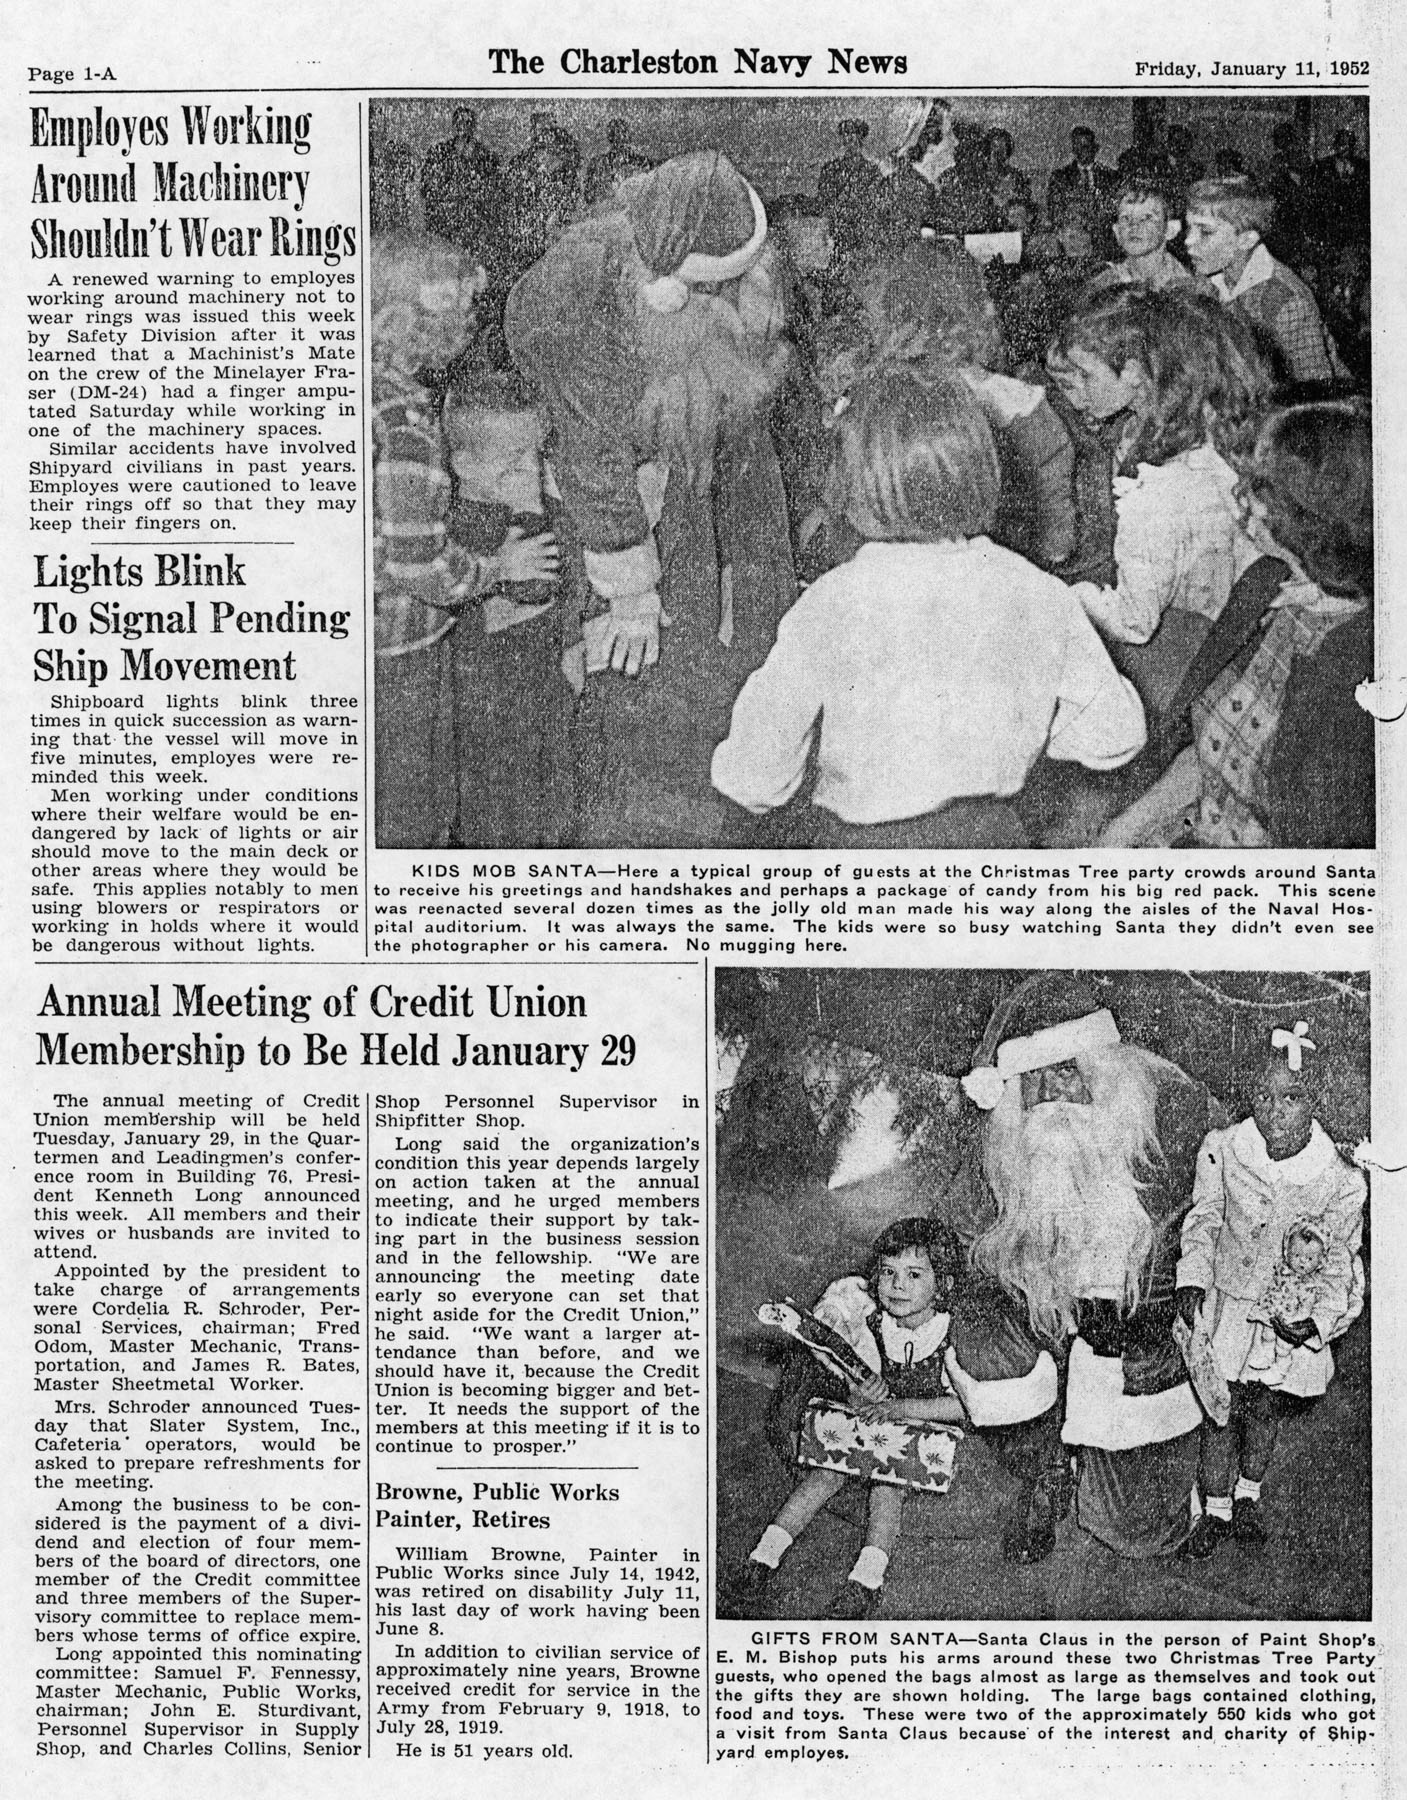 The Charleston Navy News, Volume 10, Edition 12, page ia